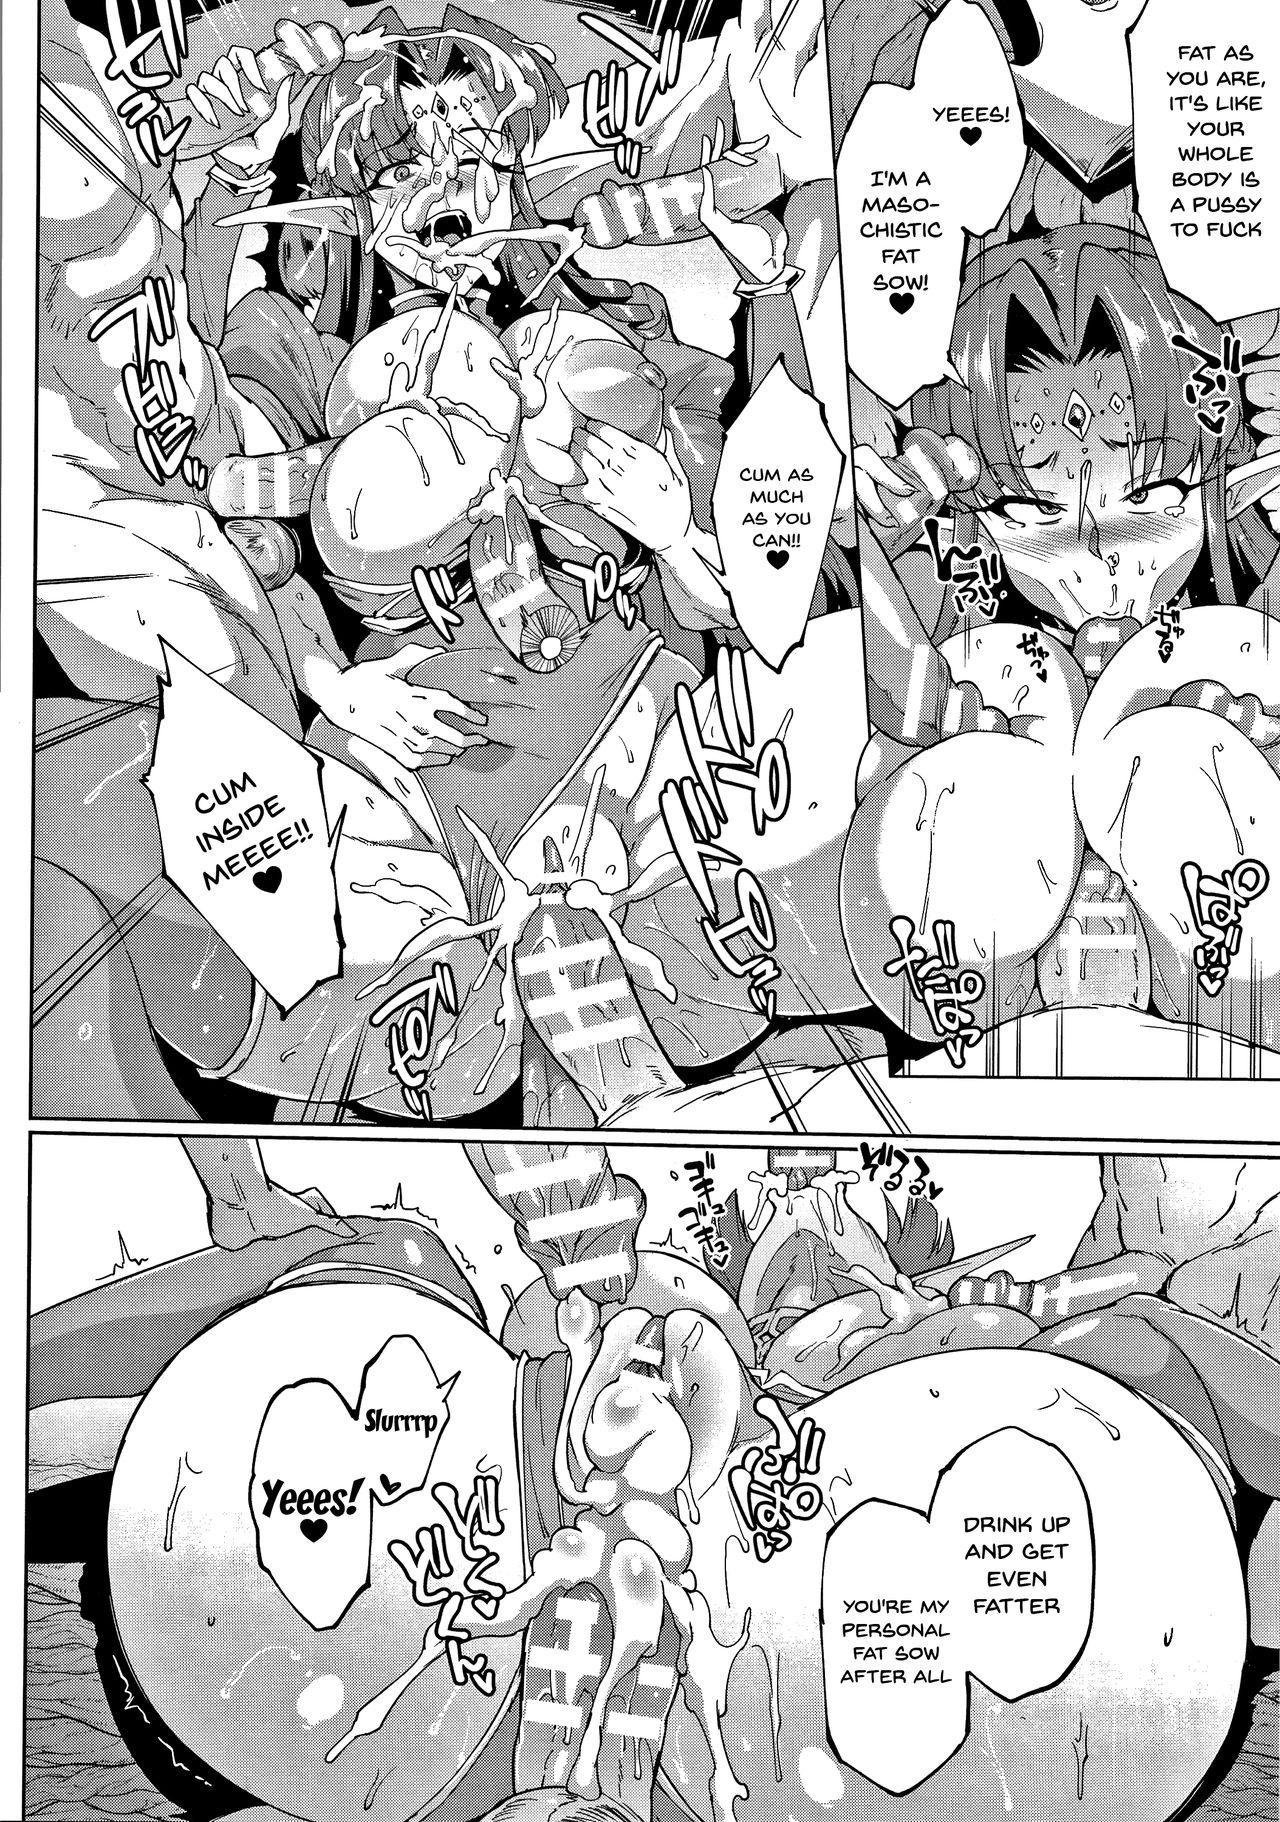 [Fan no Hitori] Sennen Reijou ~My Lady, My Master~  Ch.1-6 [English] {Doujins.com} 112